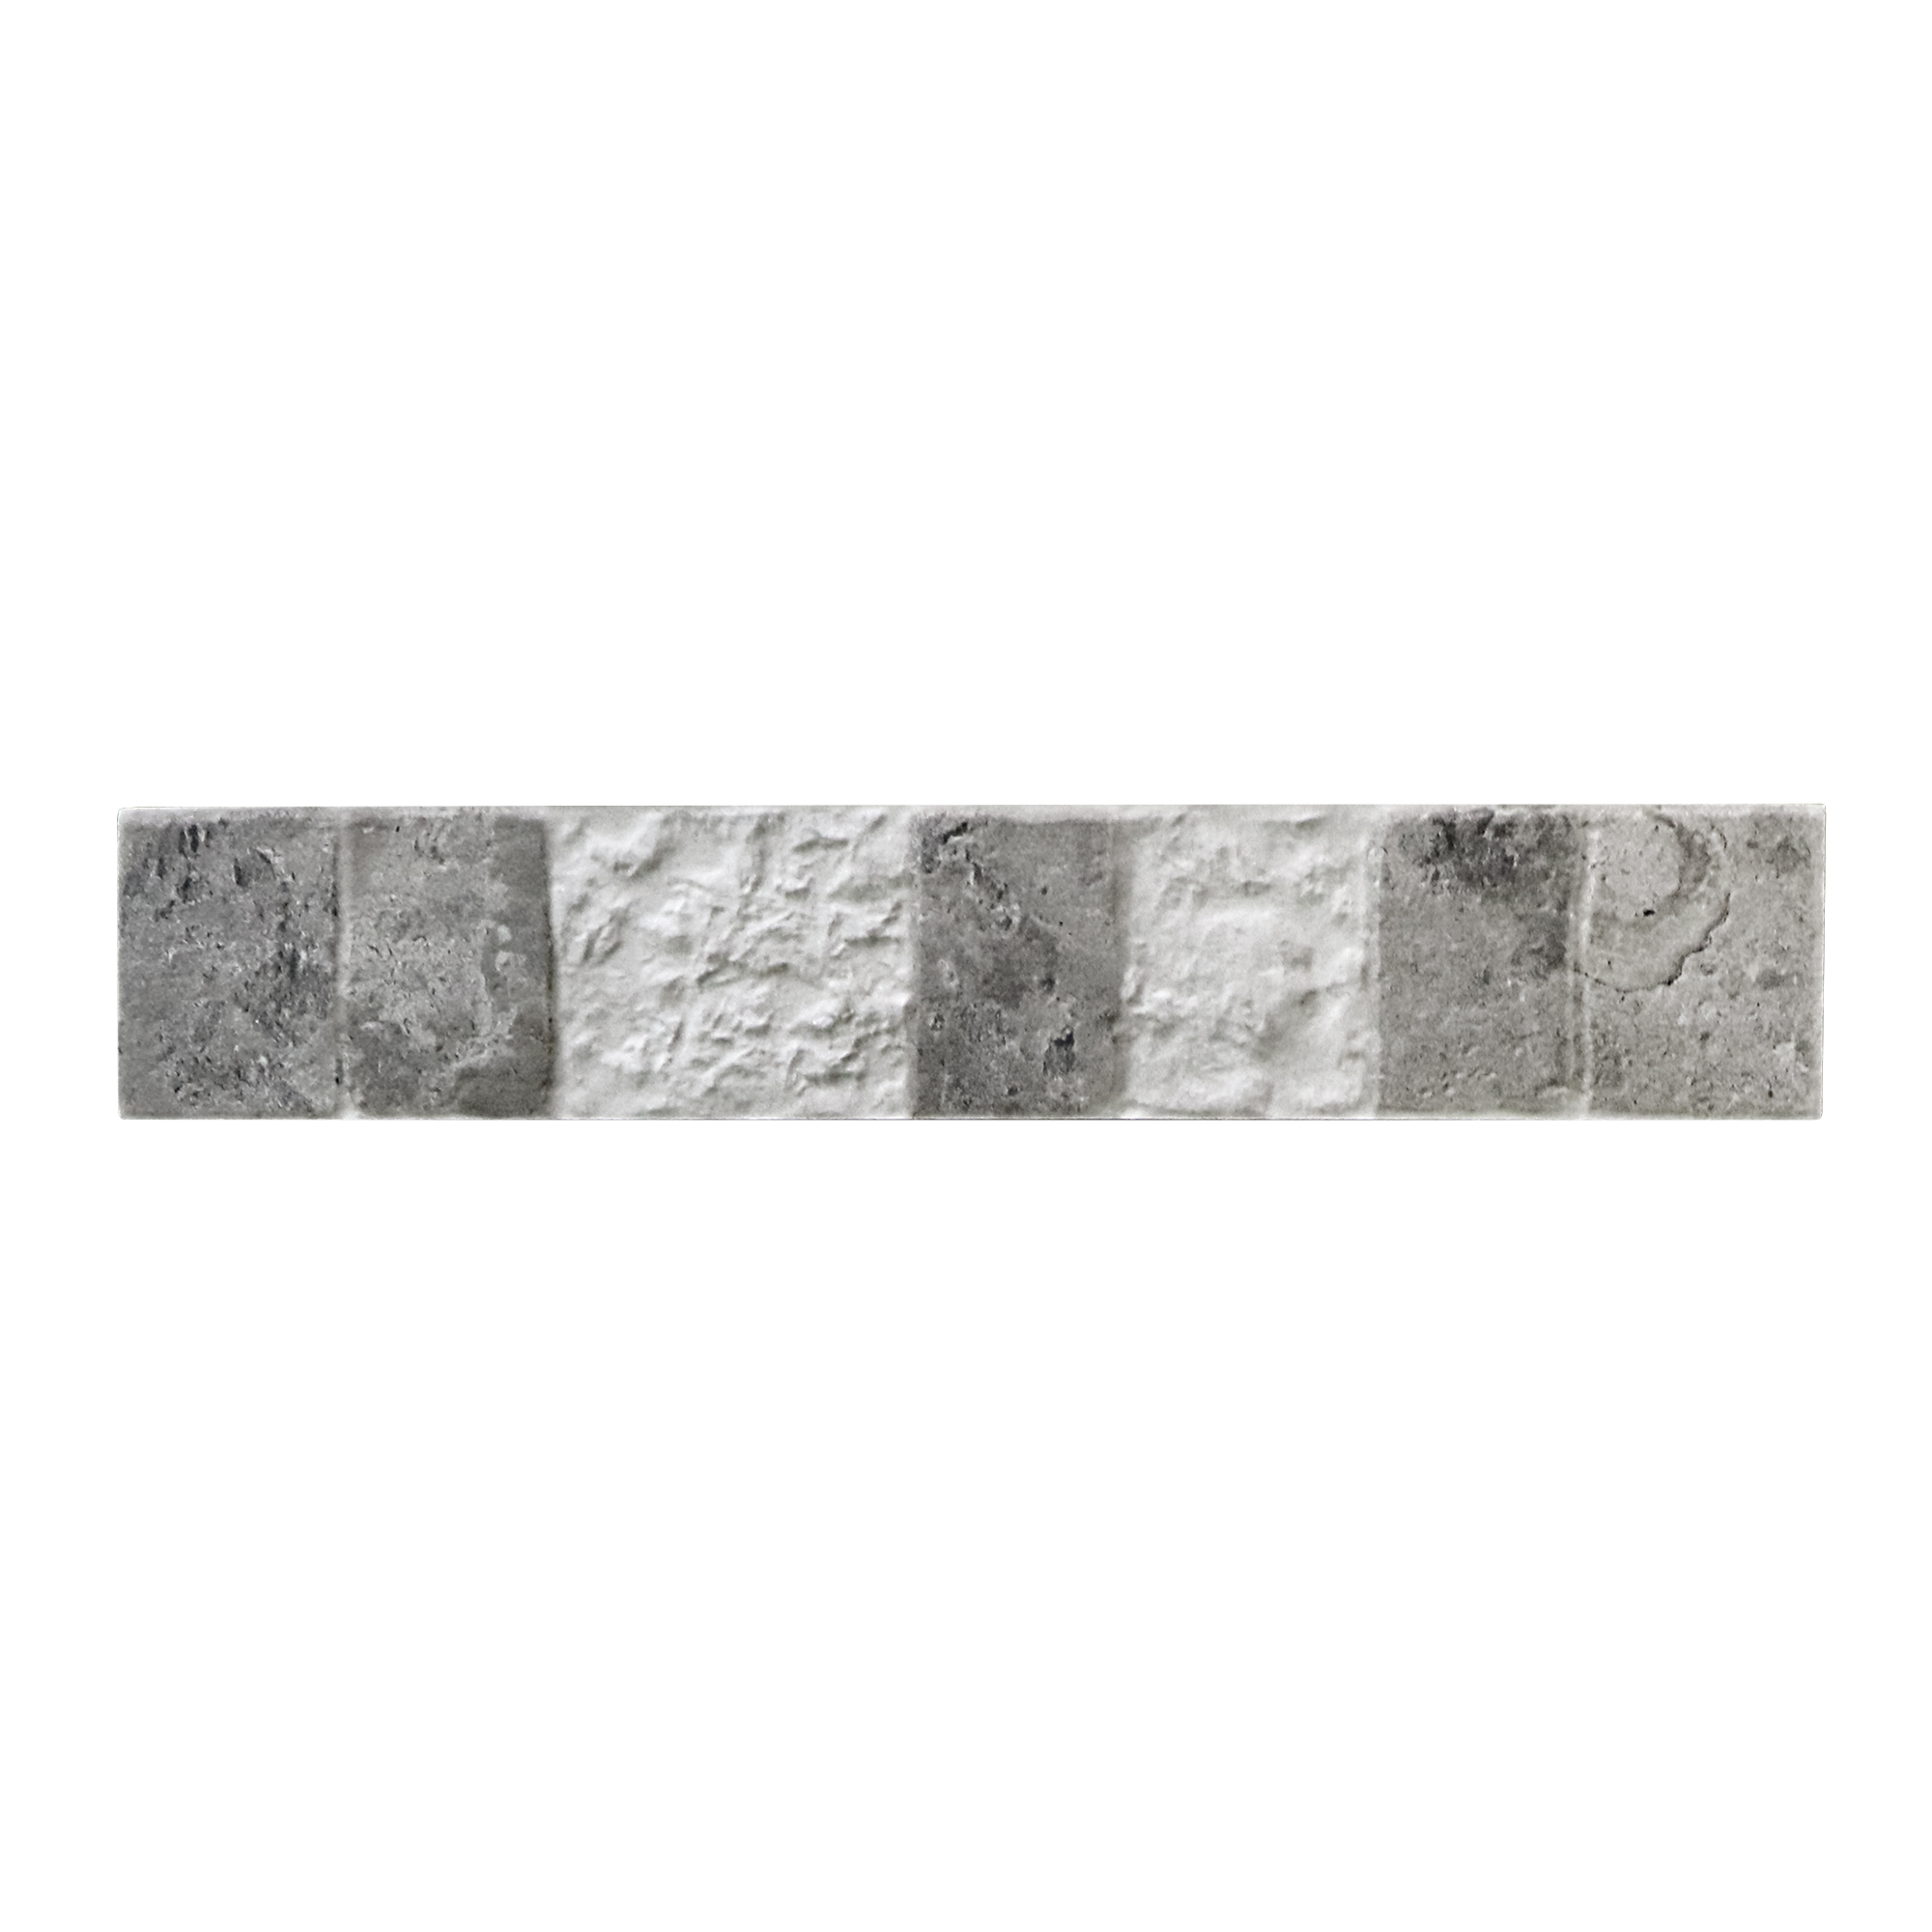 Плитка настенная Oset blend grey 8x44.25 упаковка24